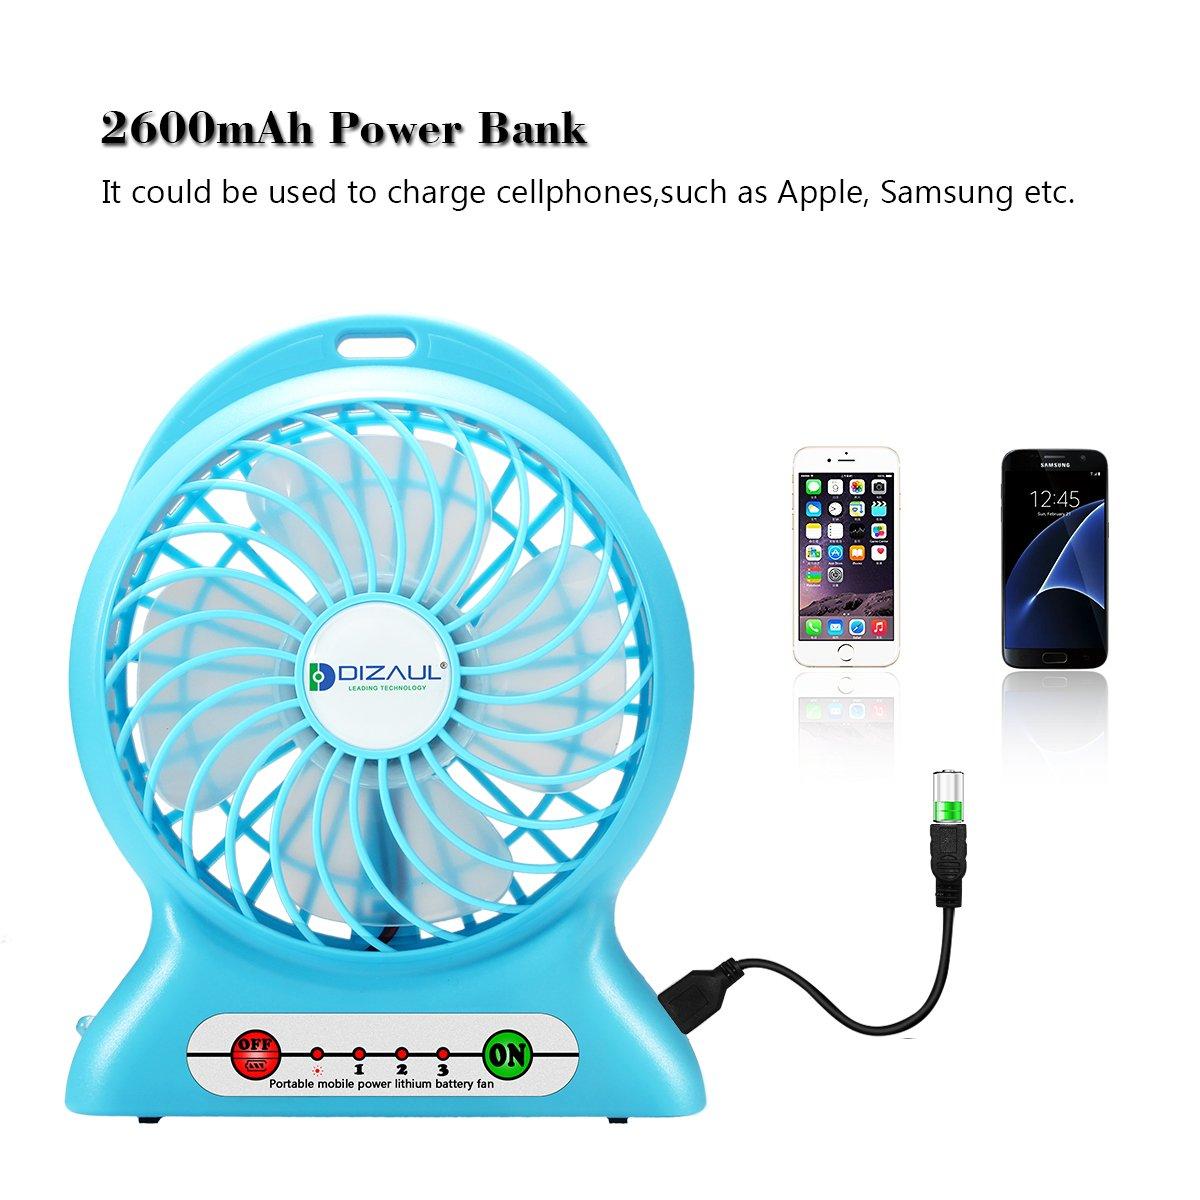 Amazon.com: Portable Fan, Dizaul mini usb rechargeable fan with ...